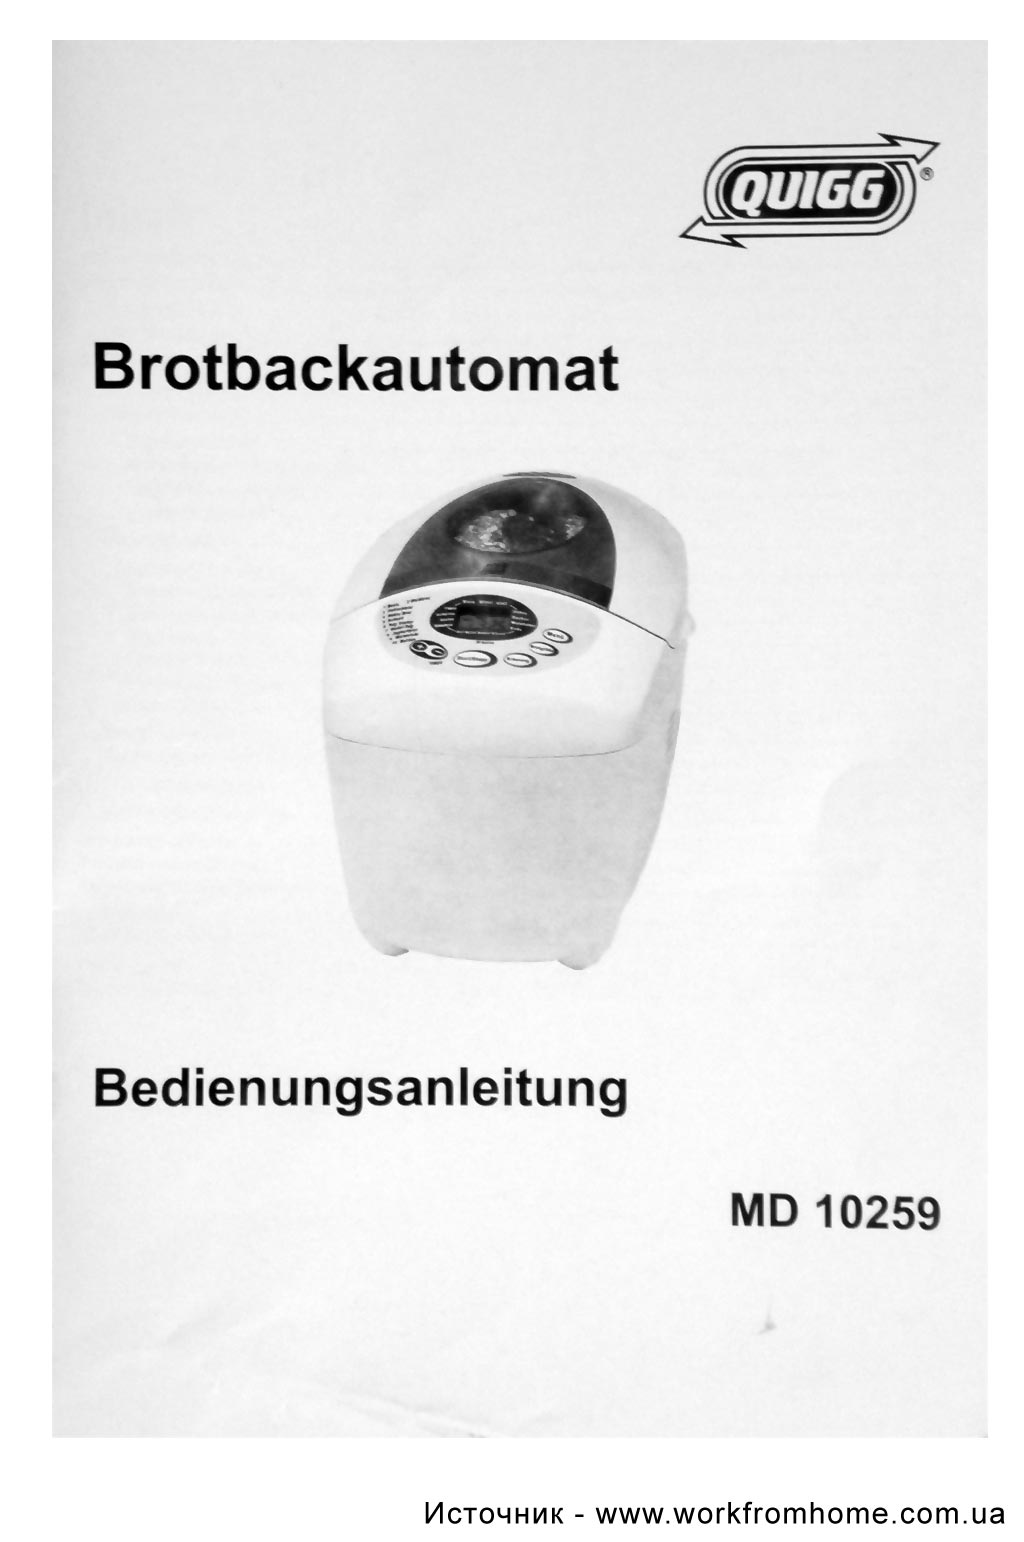 Fif Brotbackautomat Cbm 2000 Bedienungsanleitung Pdf